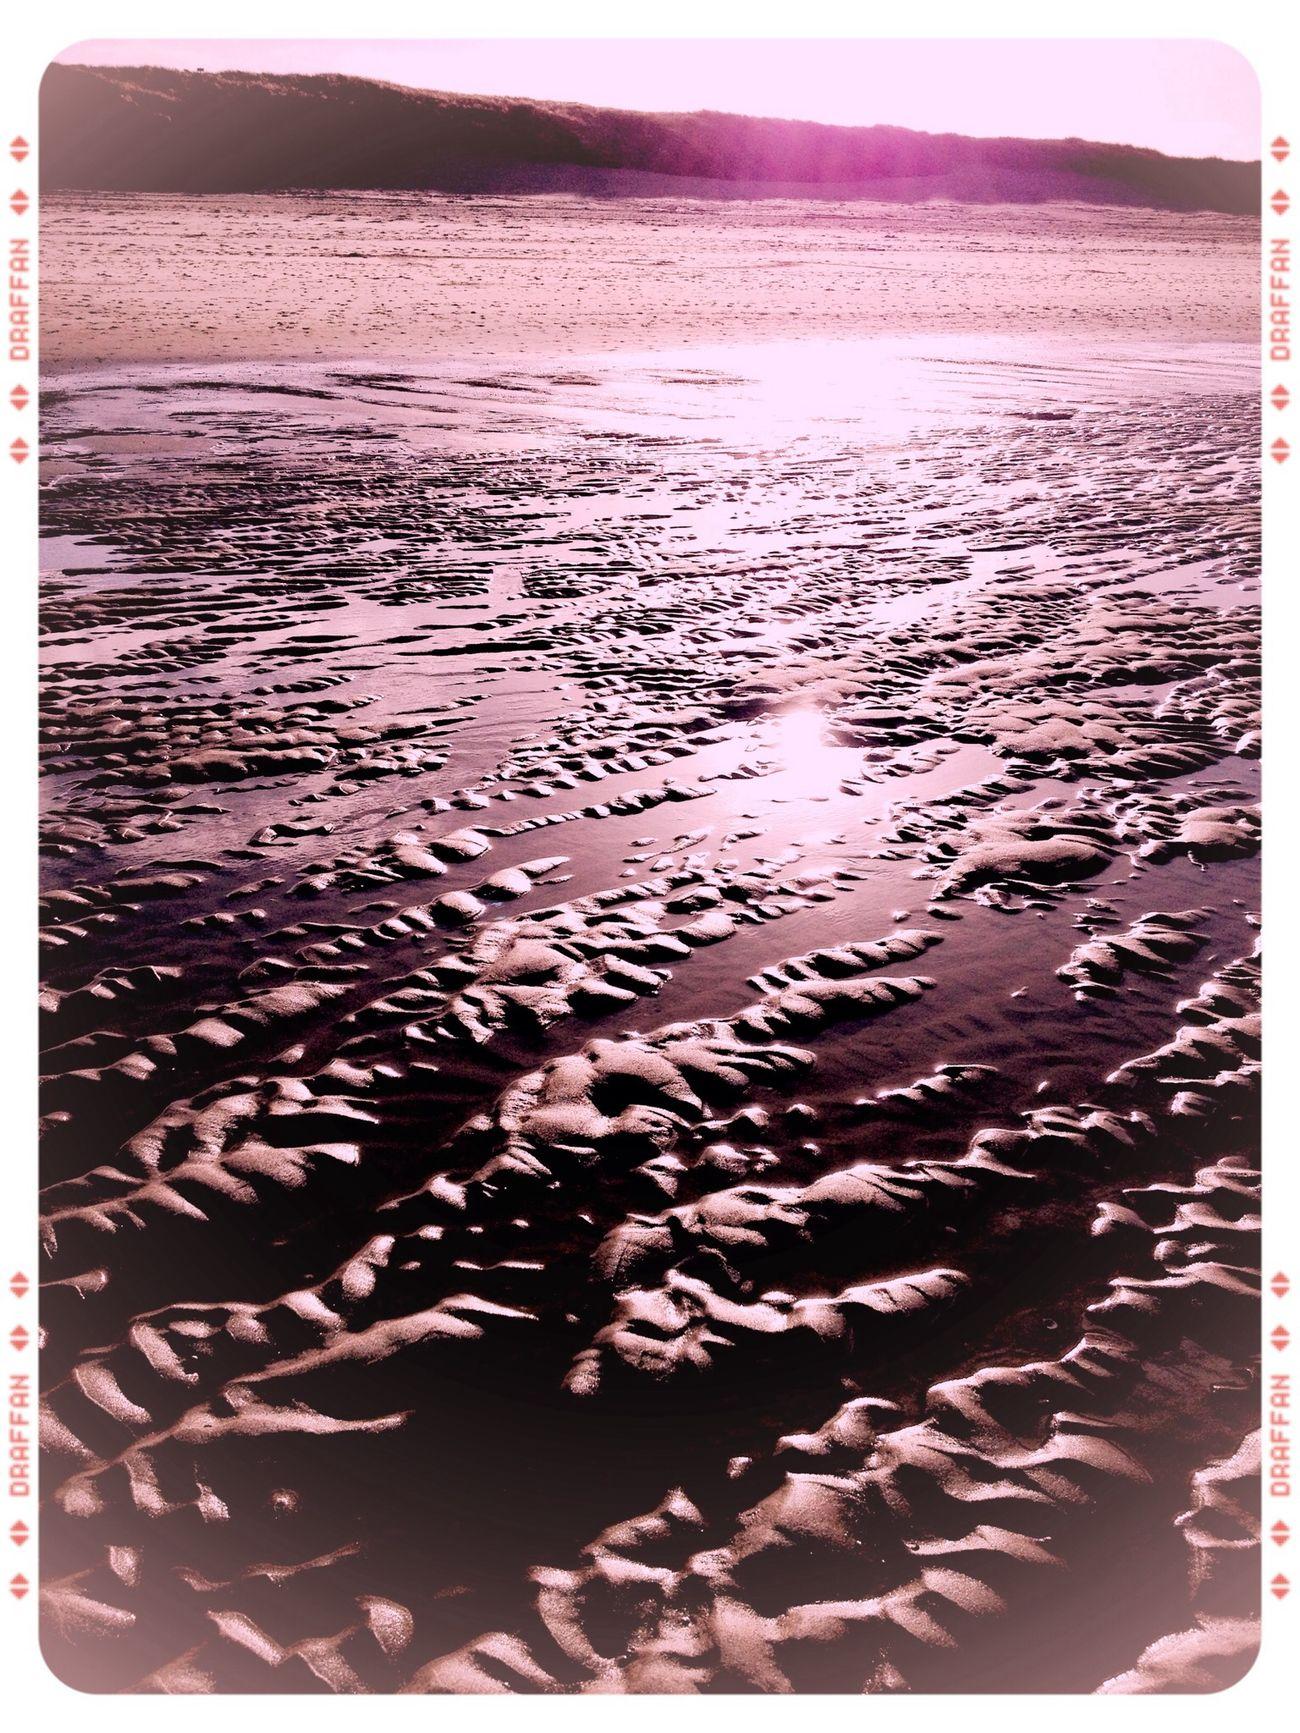 Sunny Day Beachphotography